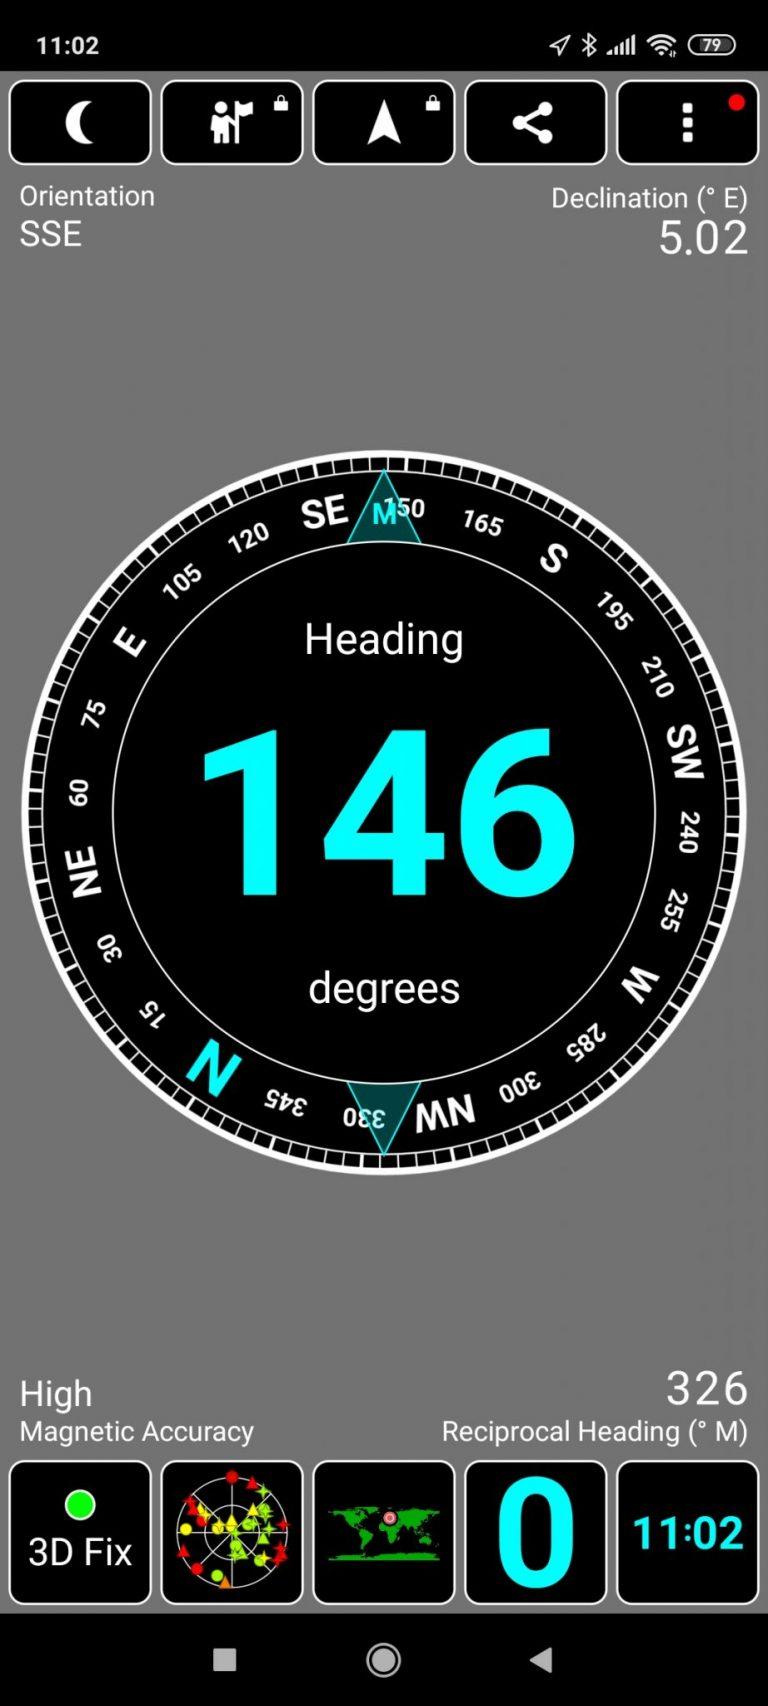 Redmi Note 9 Pro okostelefon teszt 25